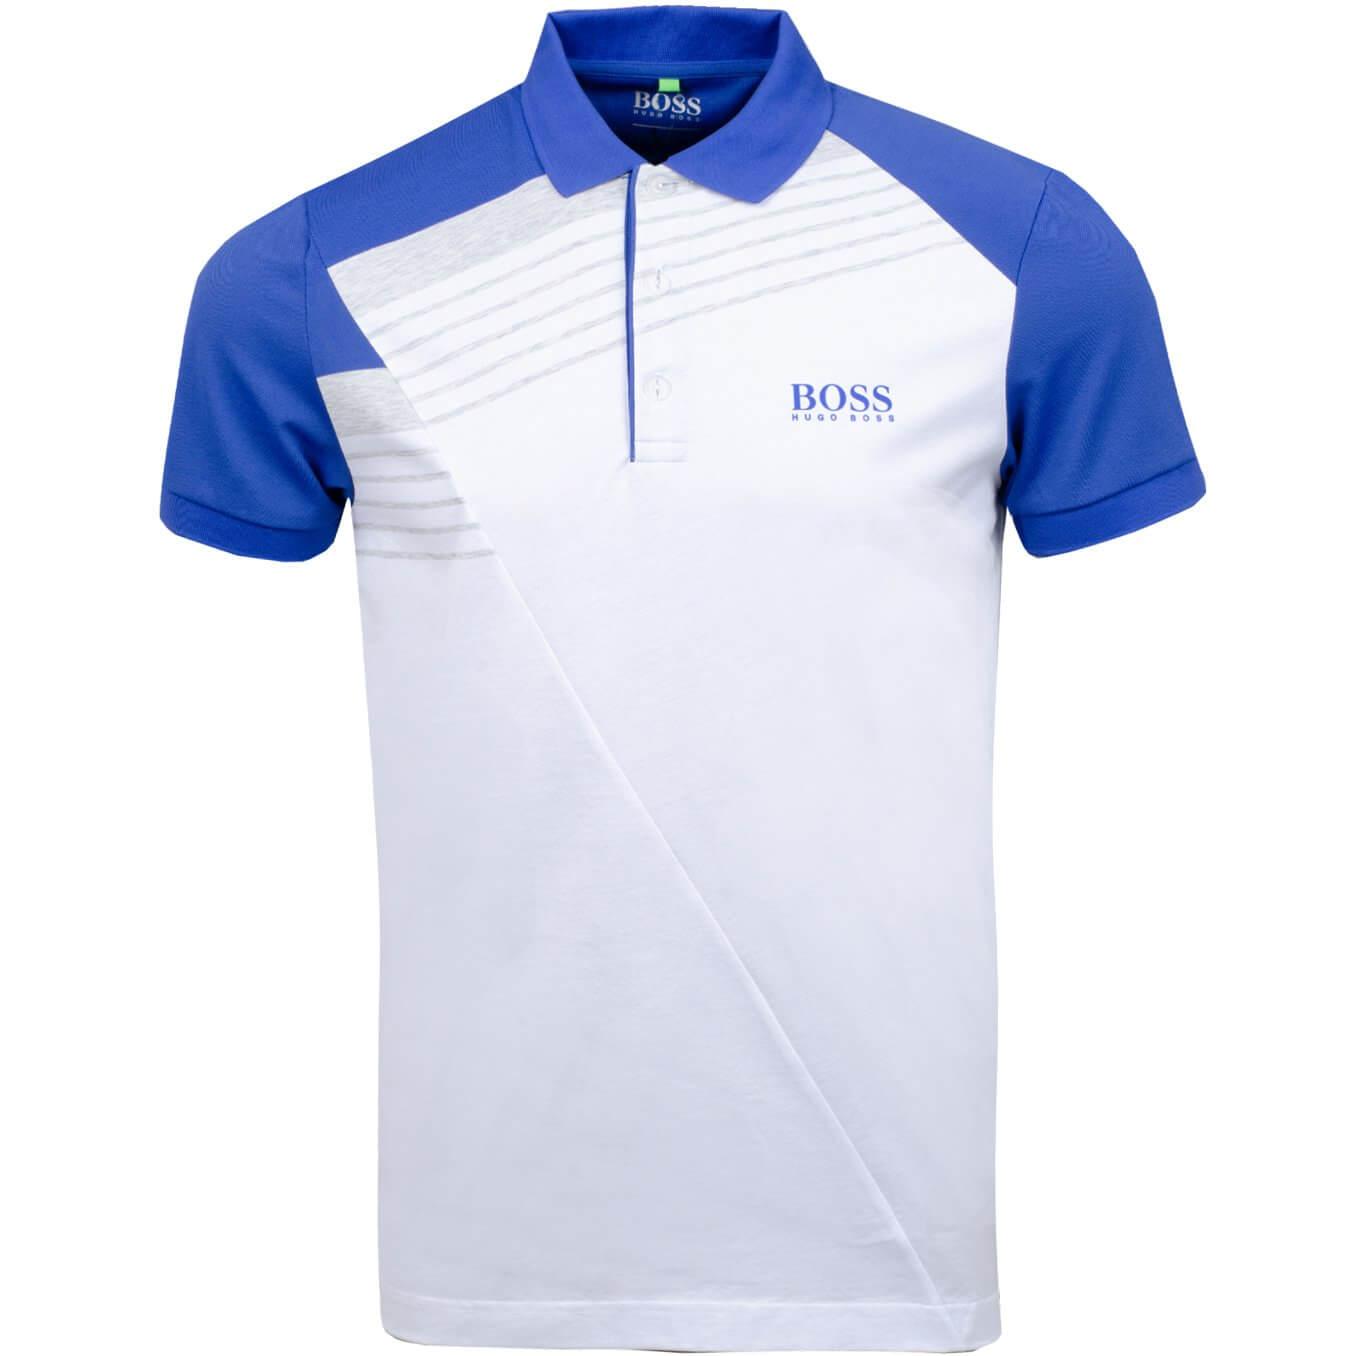 Hugo Boss - Paddy Pro 1 in white & Blue